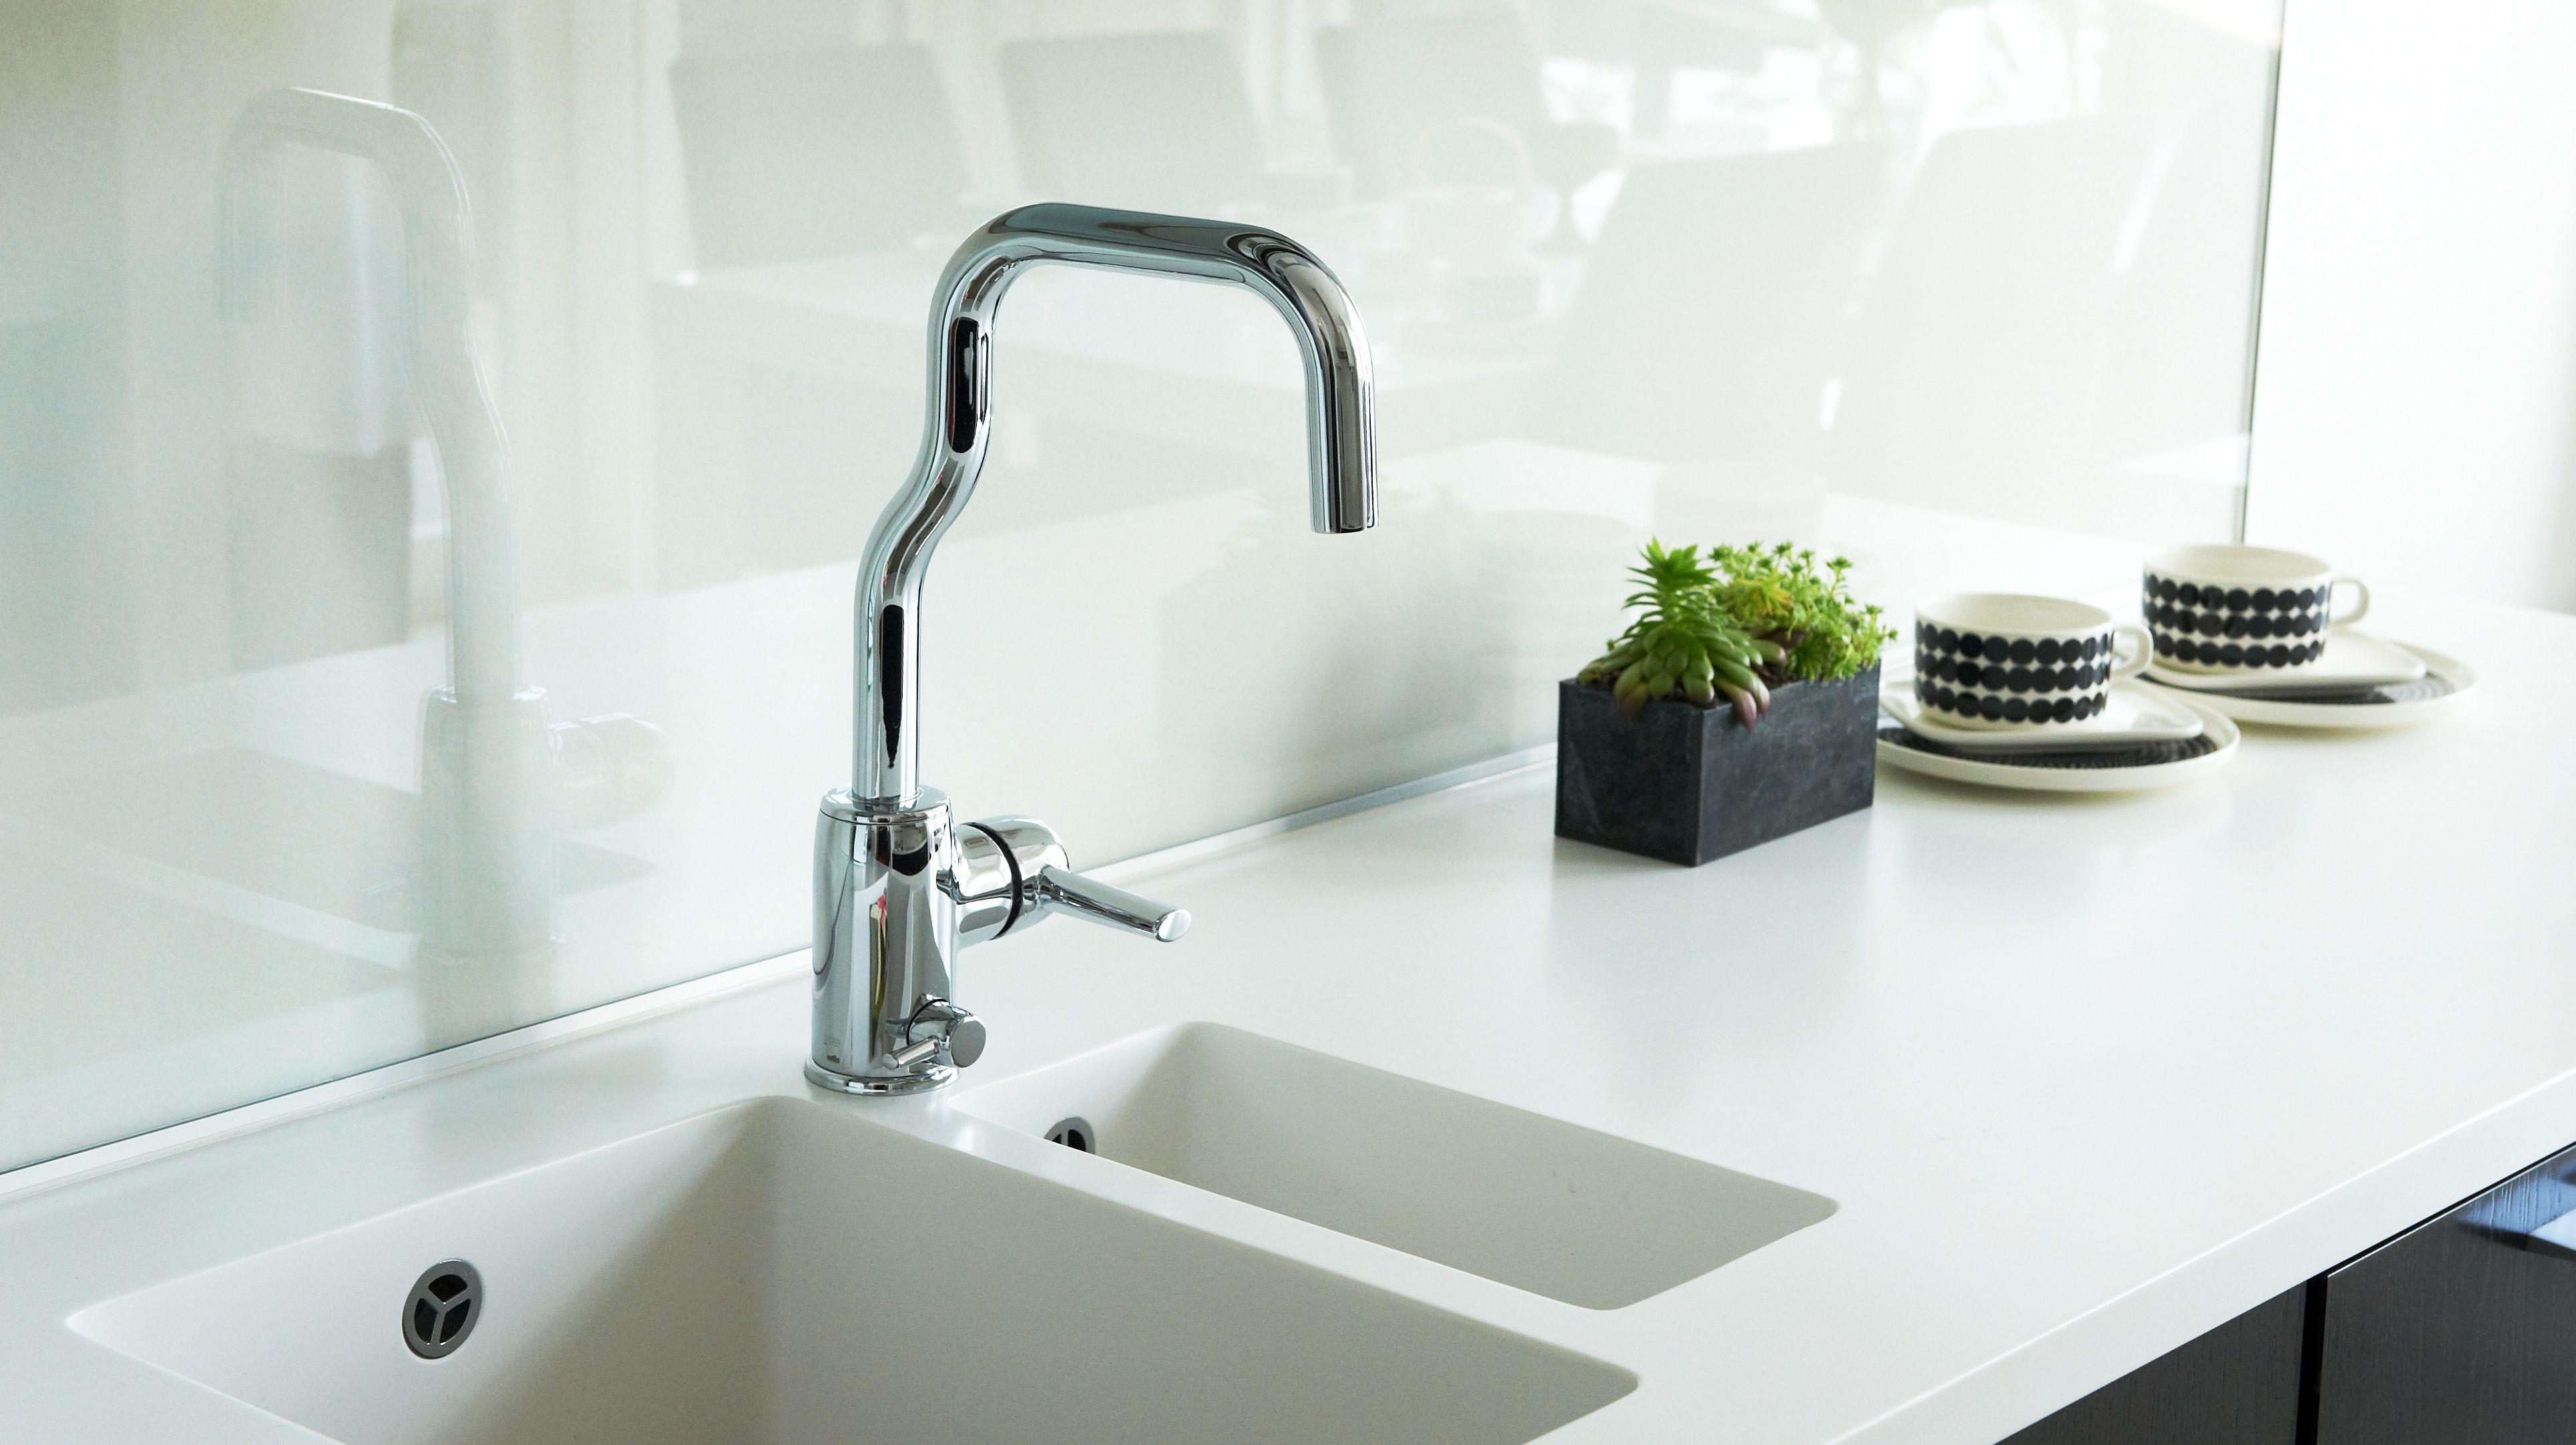 LA CUCINA ALESSI by Oras kitchen faucet 8535 - like a sculpture ...